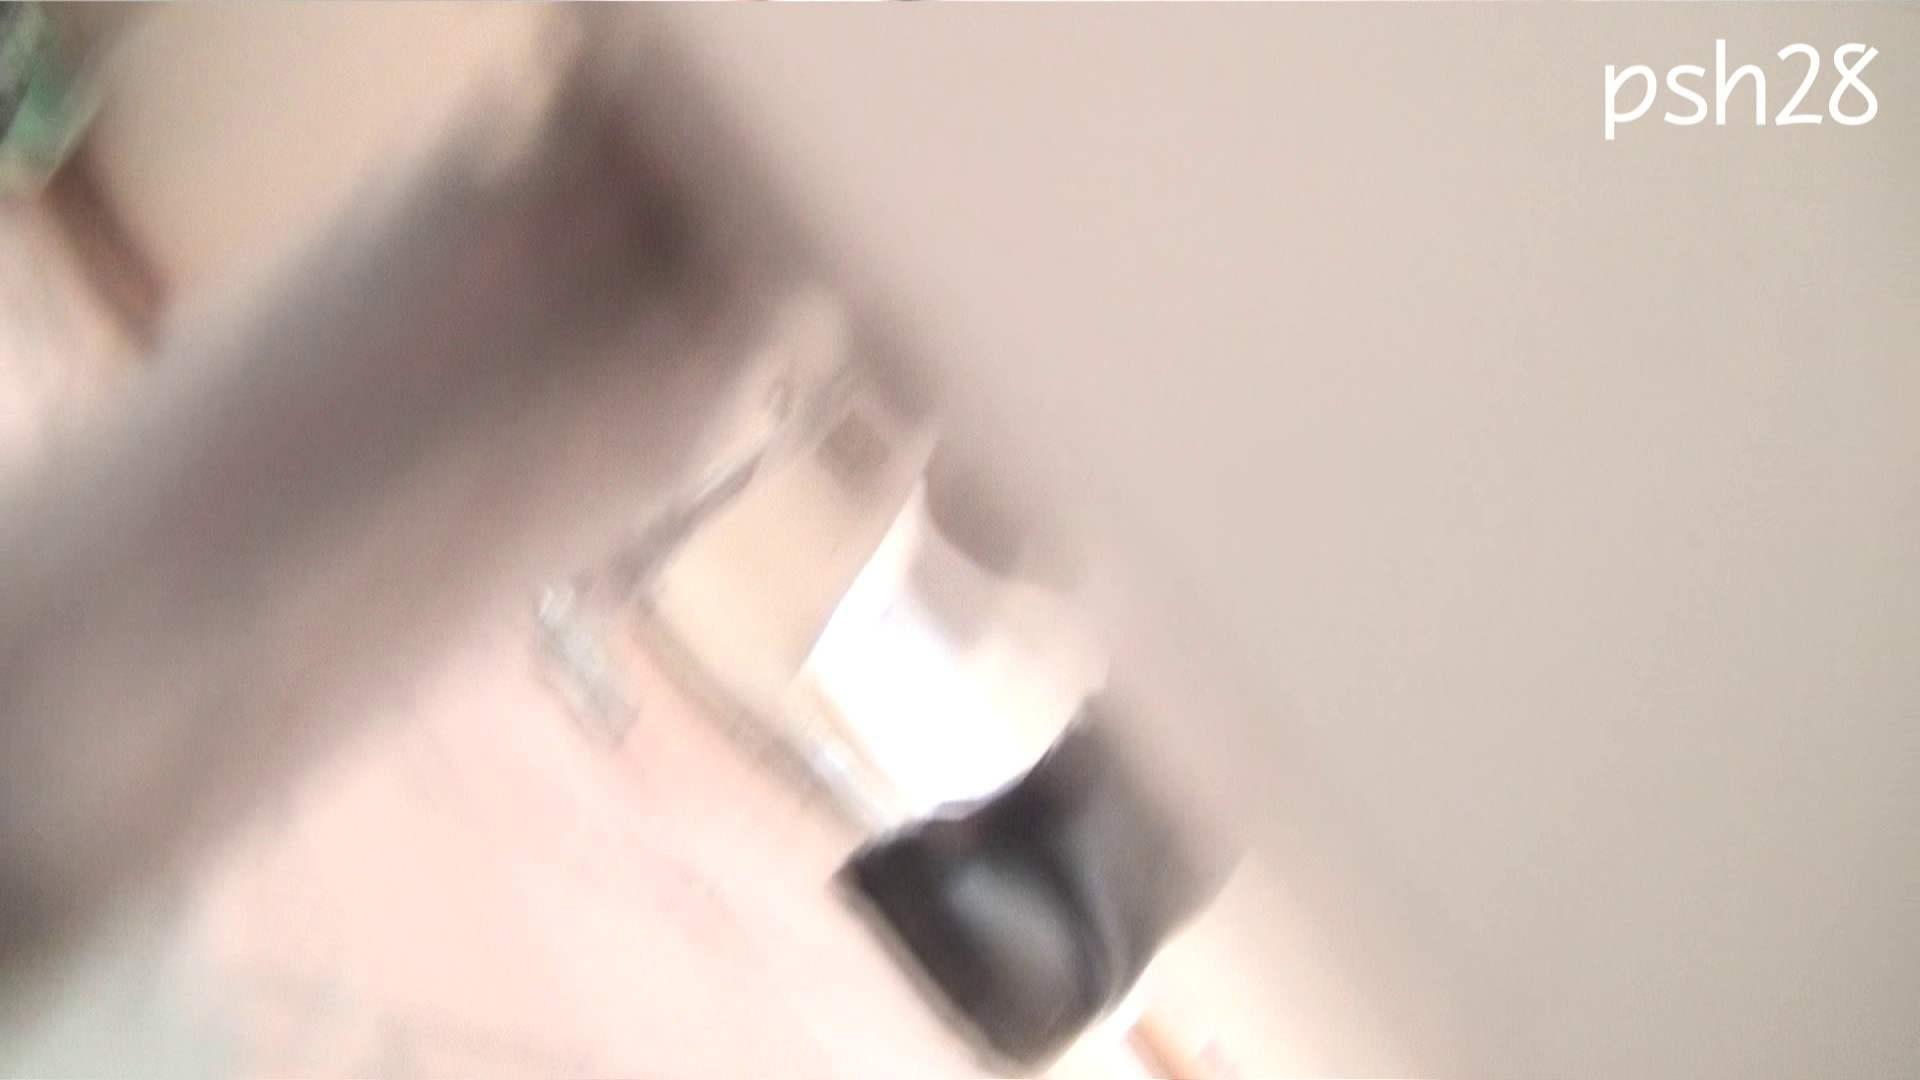 ▲復活限定▲ハイビジョン 盗神伝 Vol.28 洗面所 SEX無修正画像 69画像 46